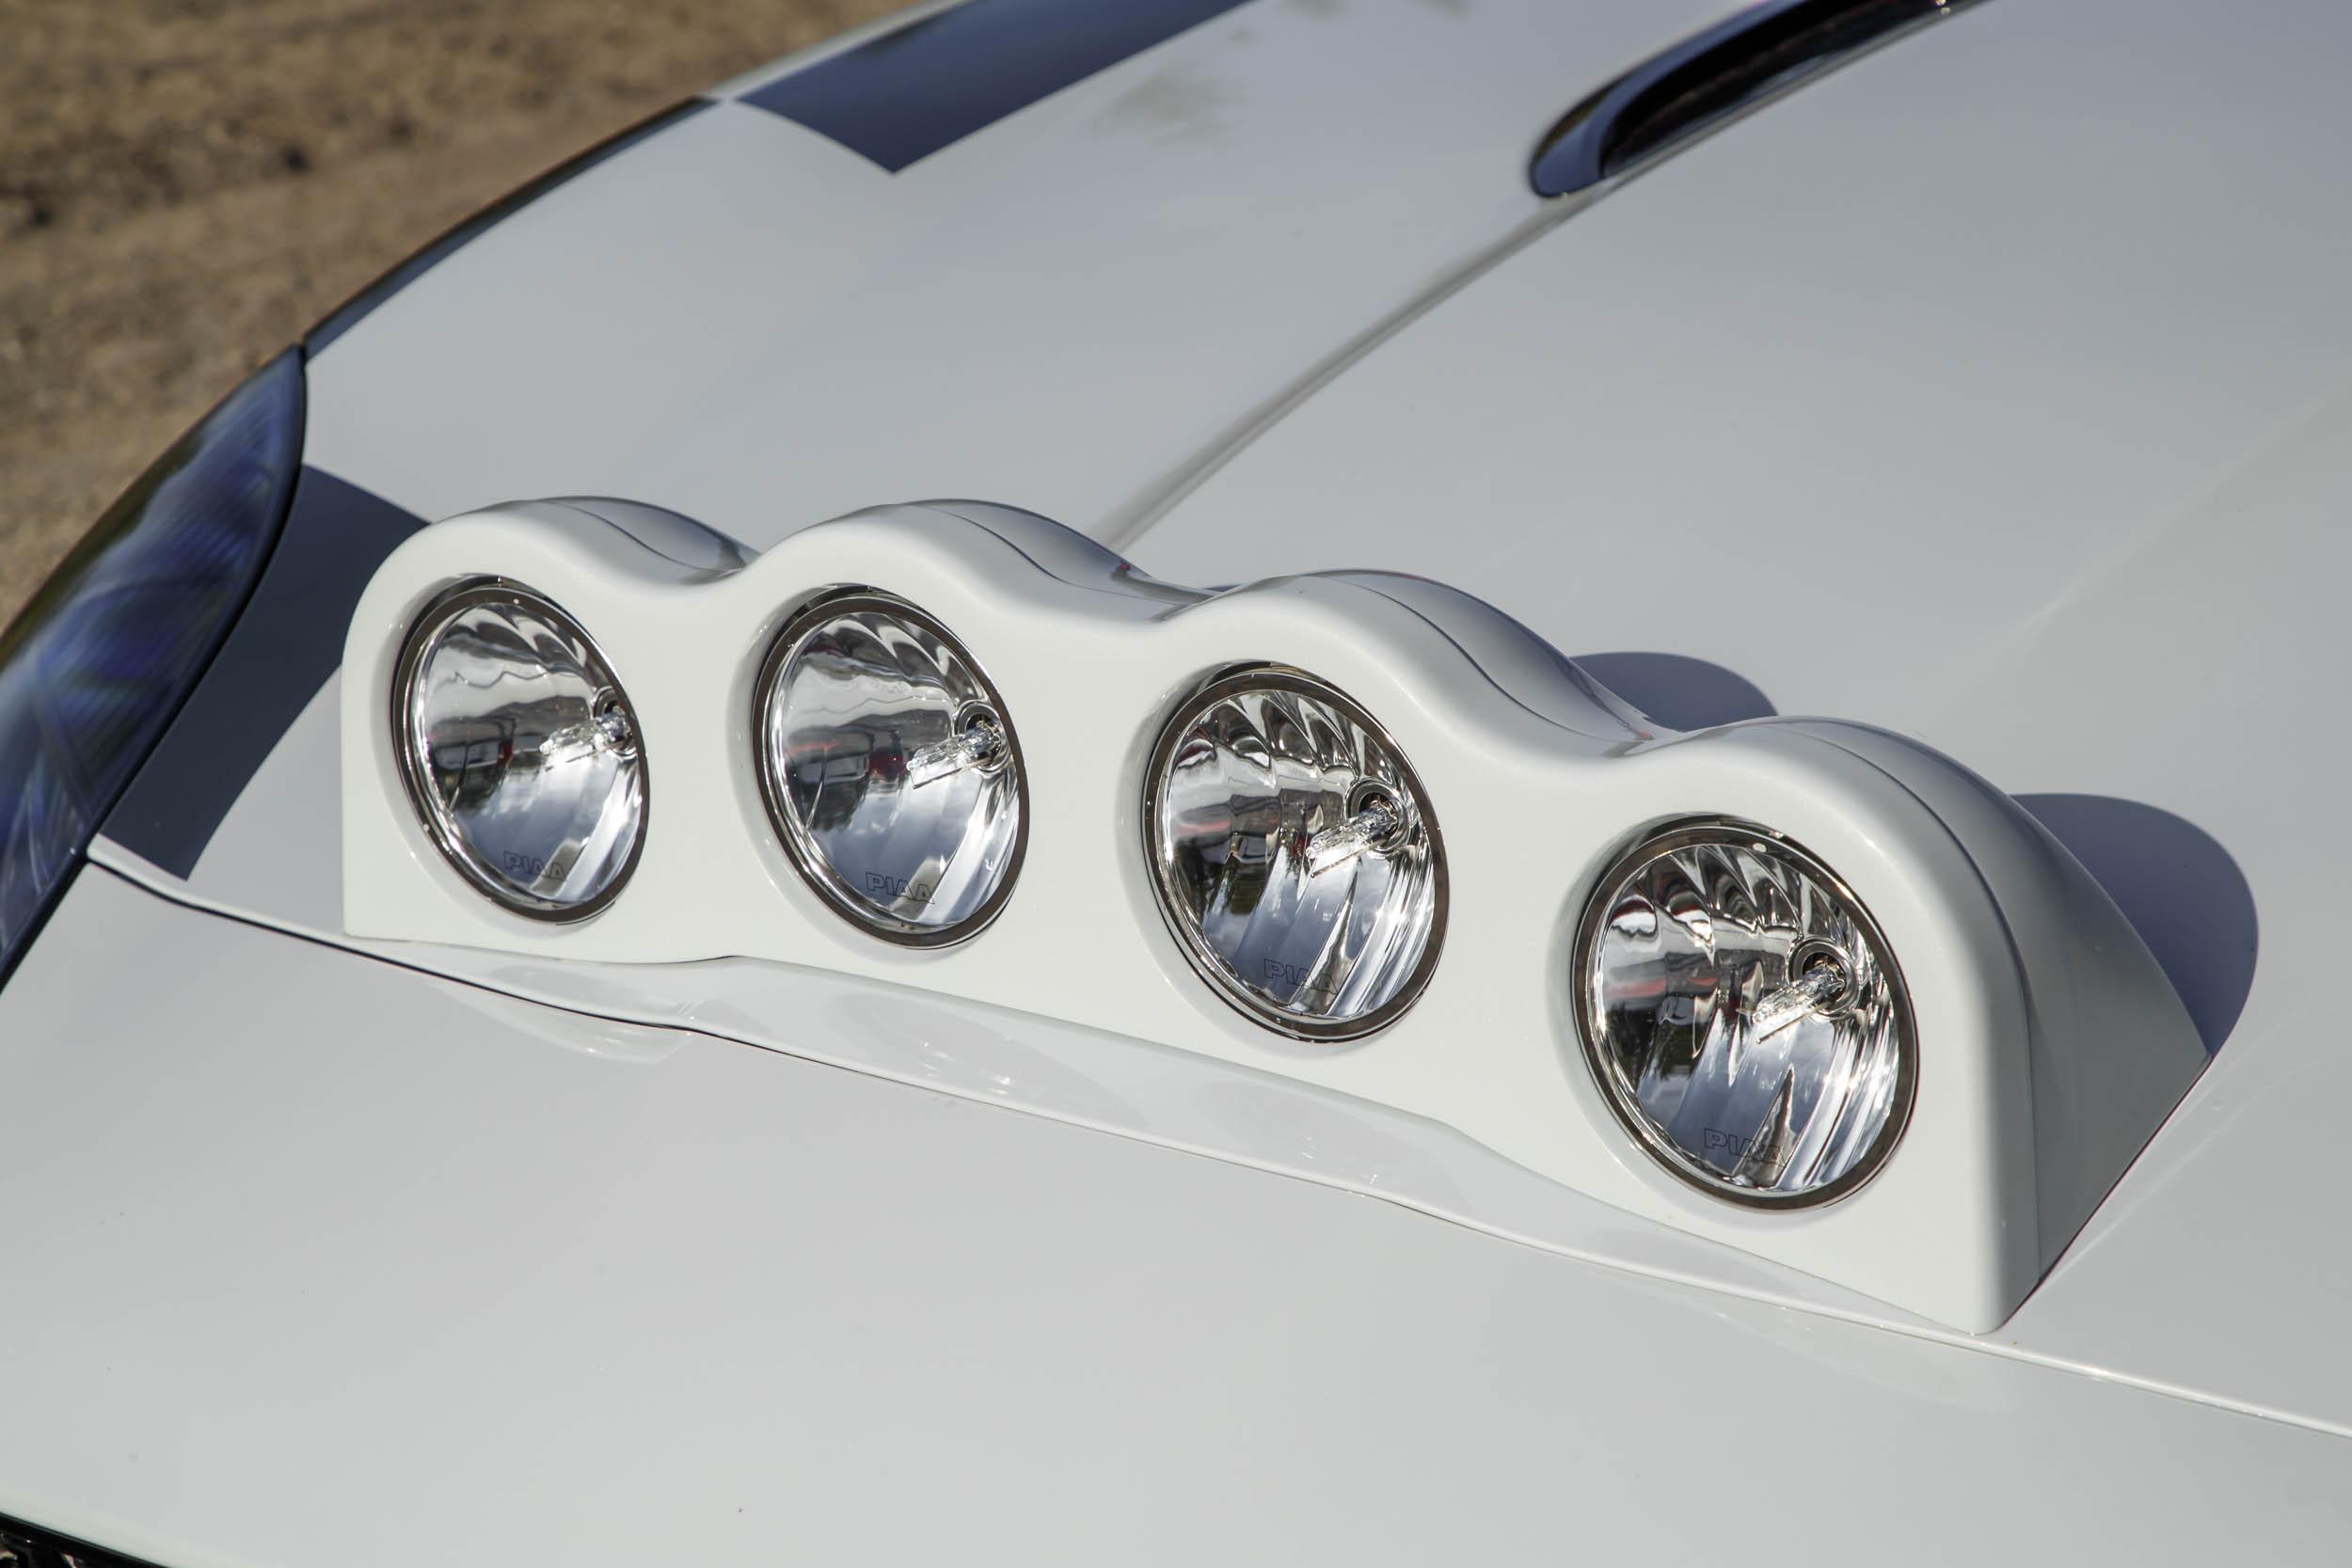 Jaguar F-type convertible rally car headlights